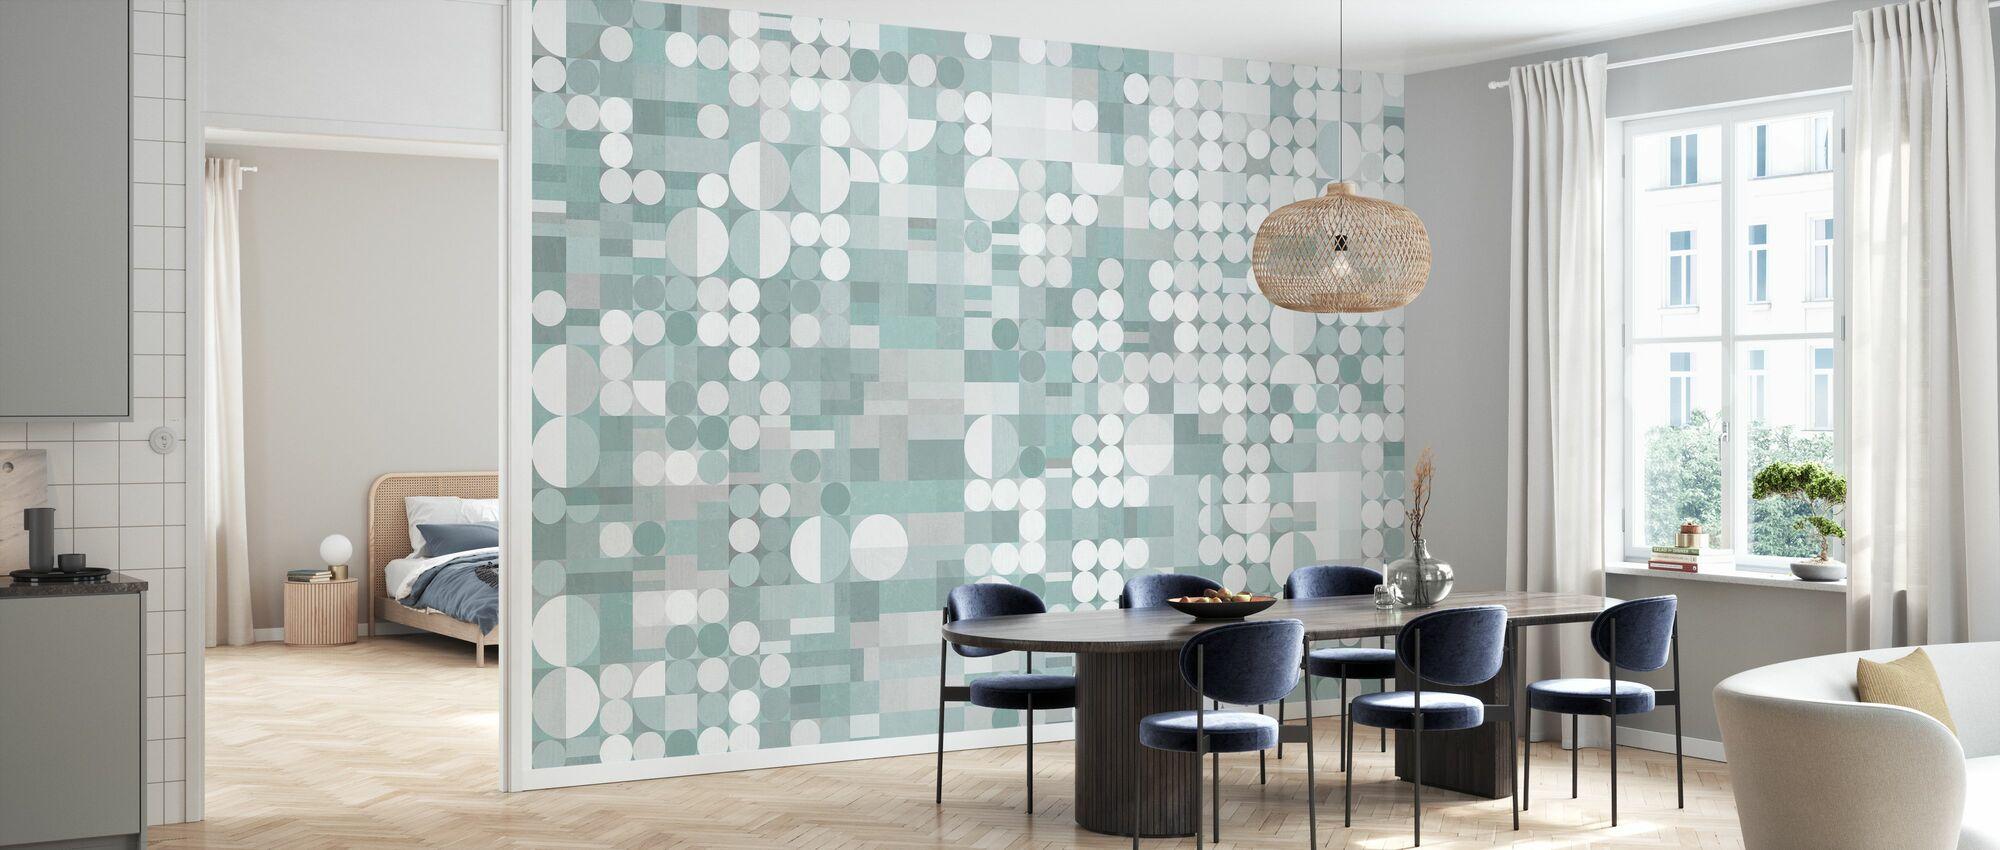 Circles and Blocks Deco III - Wallpaper - Kitchen